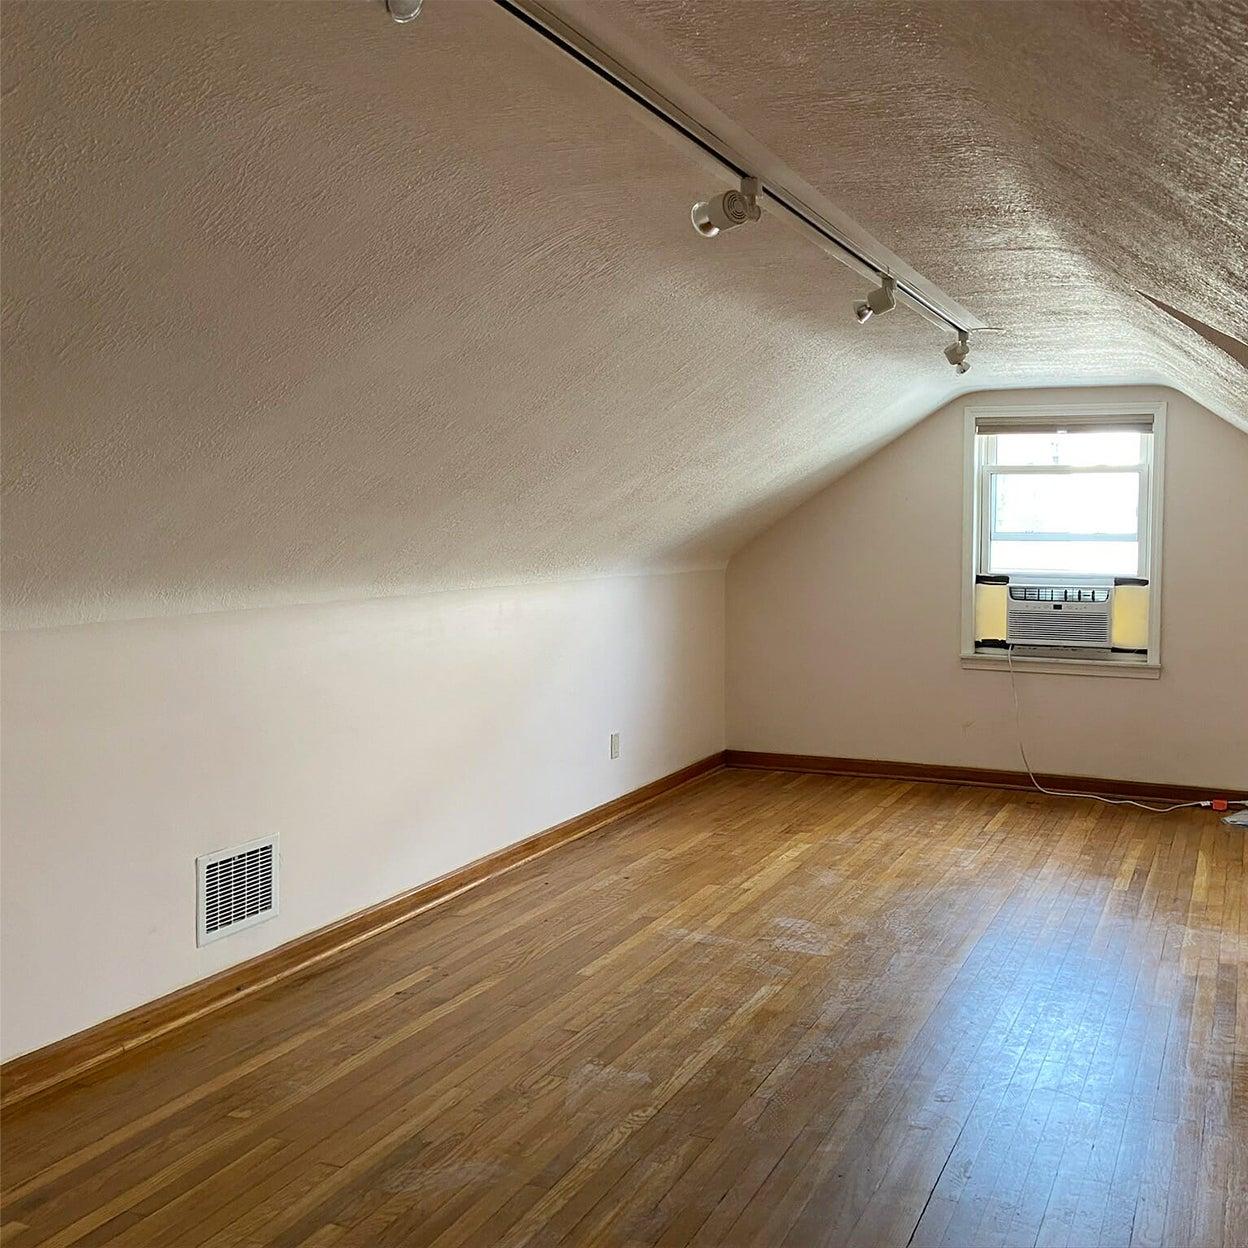 bland attic room